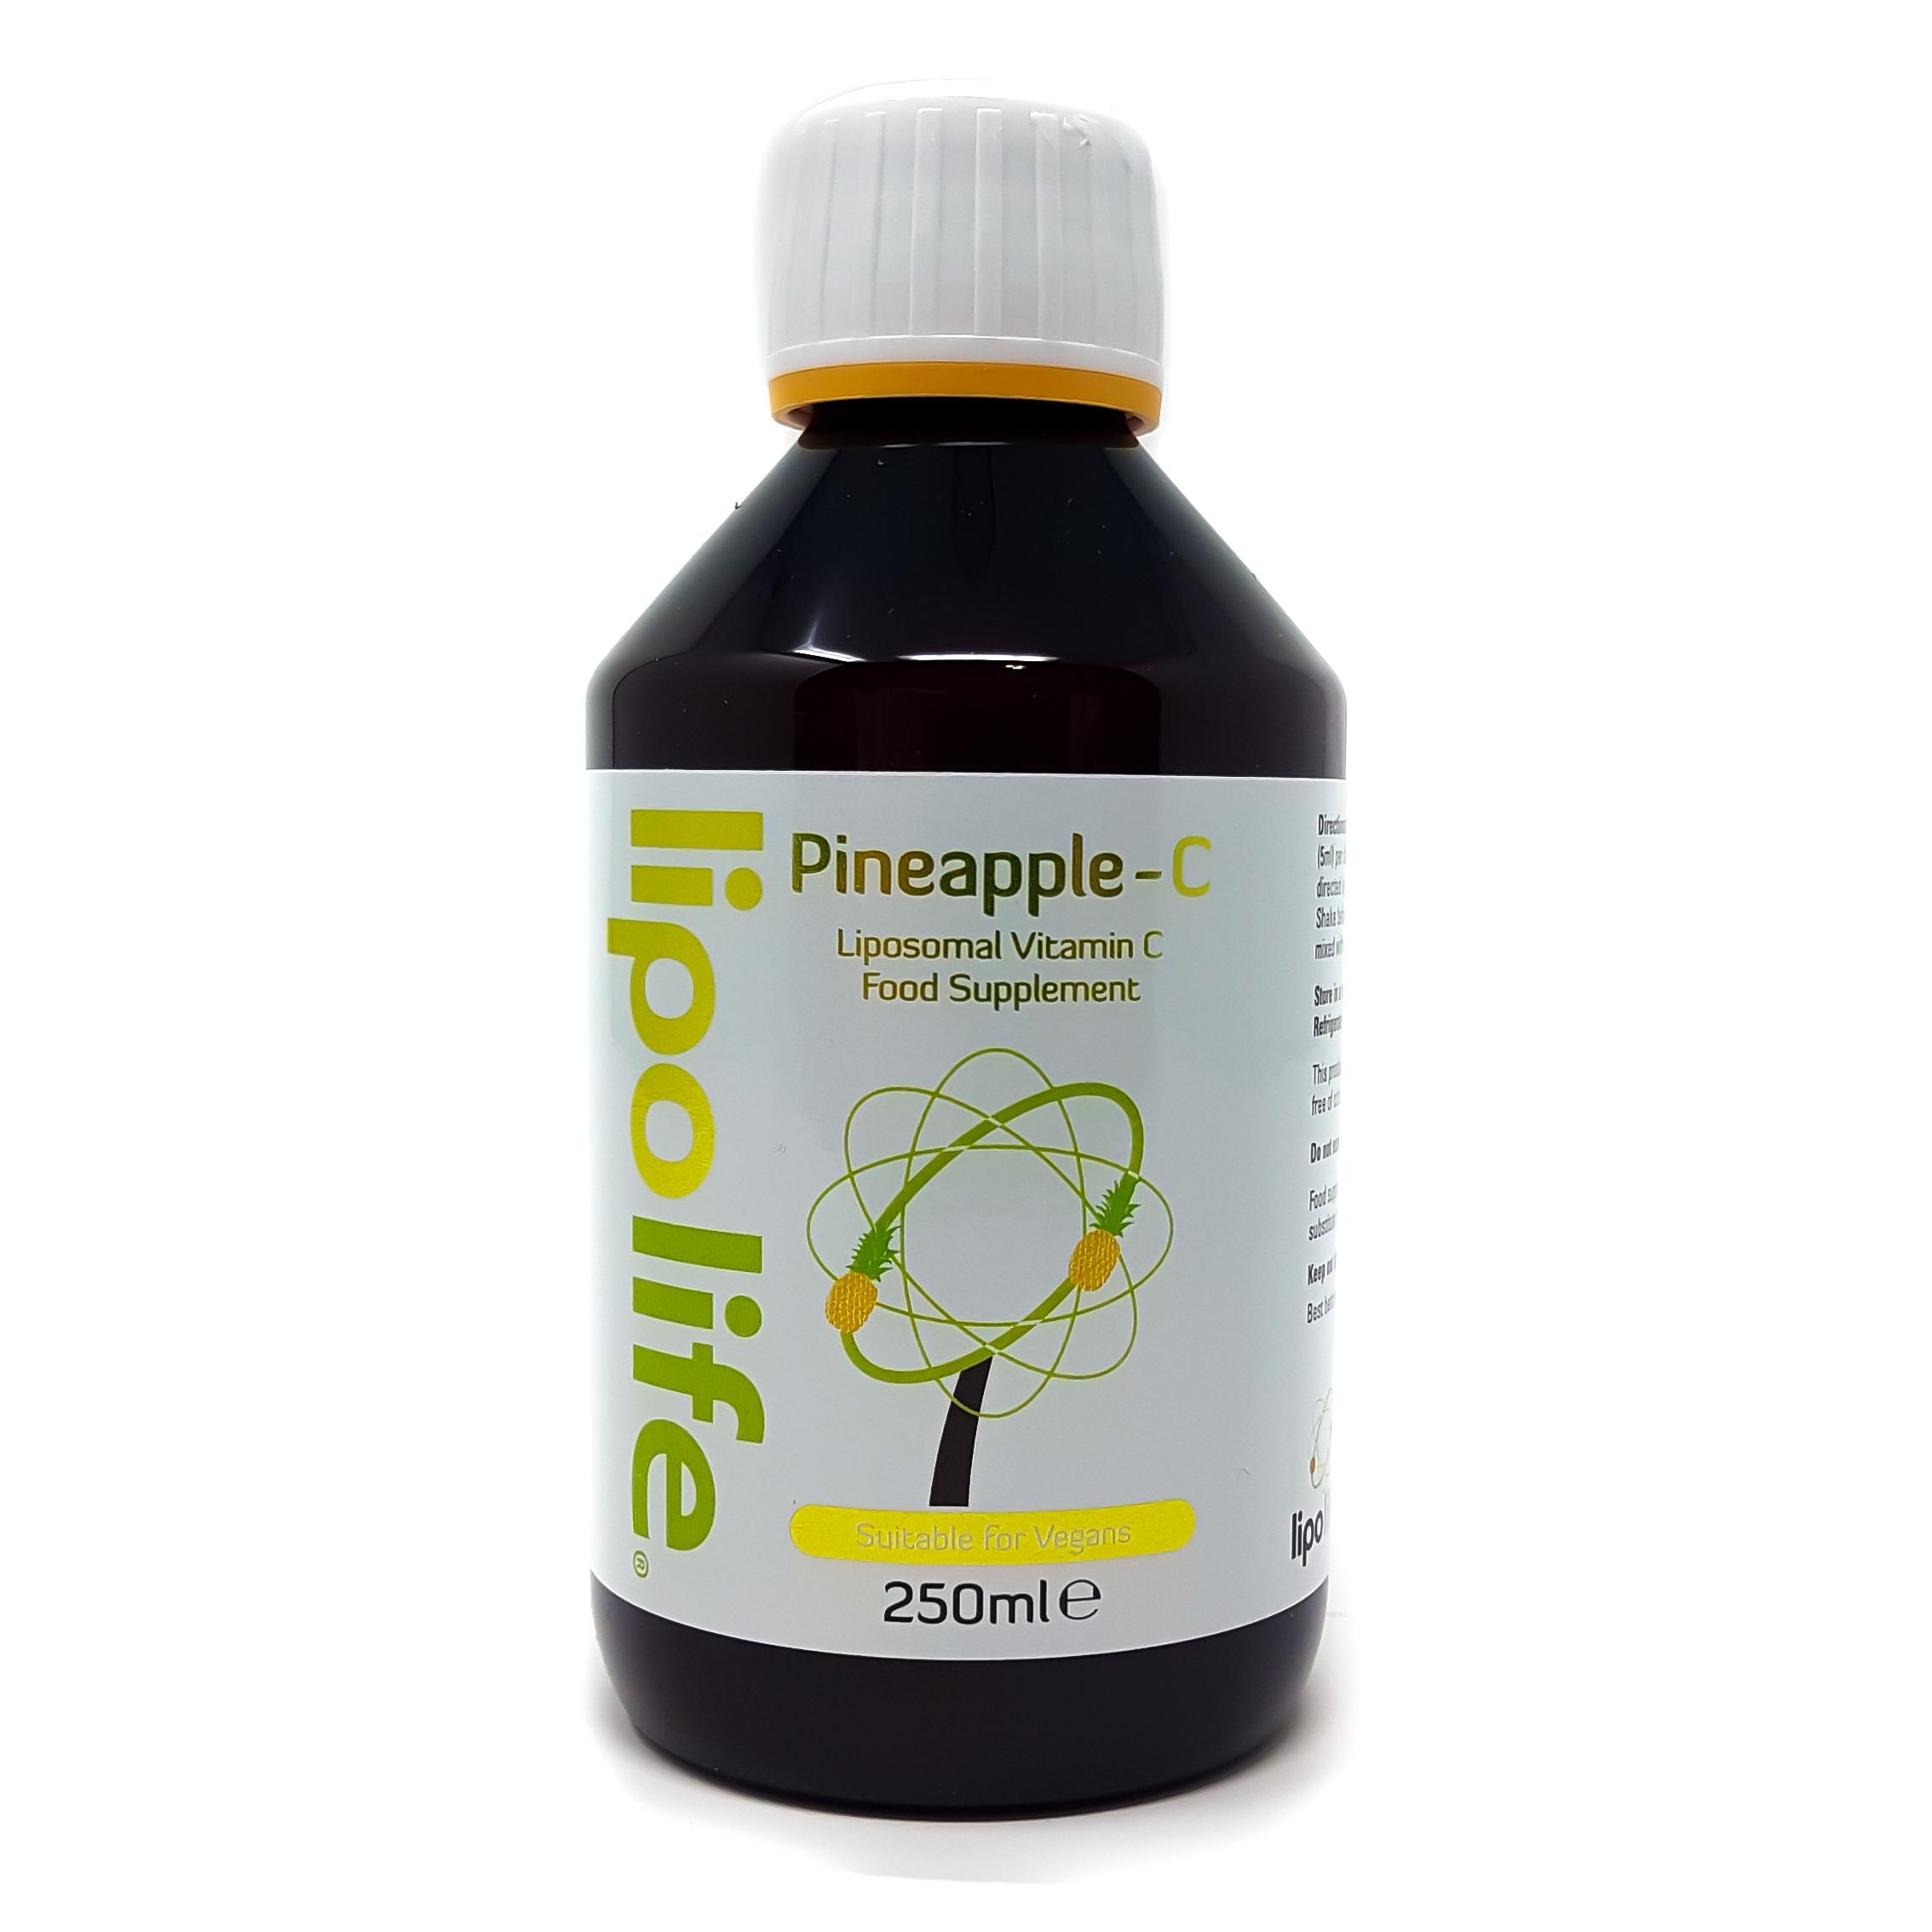 Pineapple-C Liposomal Vitamin C 250ml